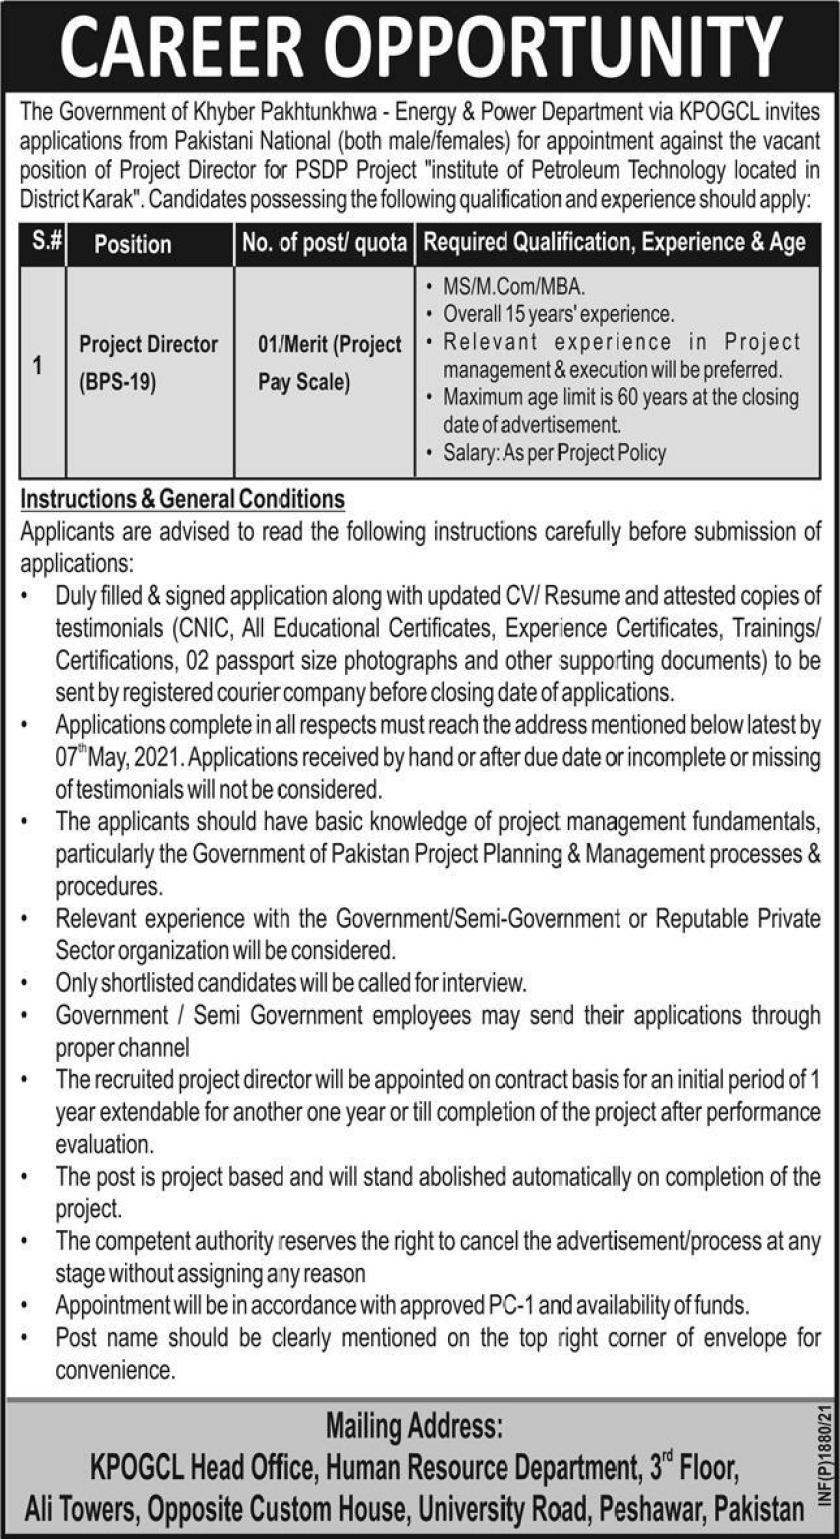 Khyber Pakhtunkhwa Oil & Gas Company Limited KPOGCL Jobs 2021